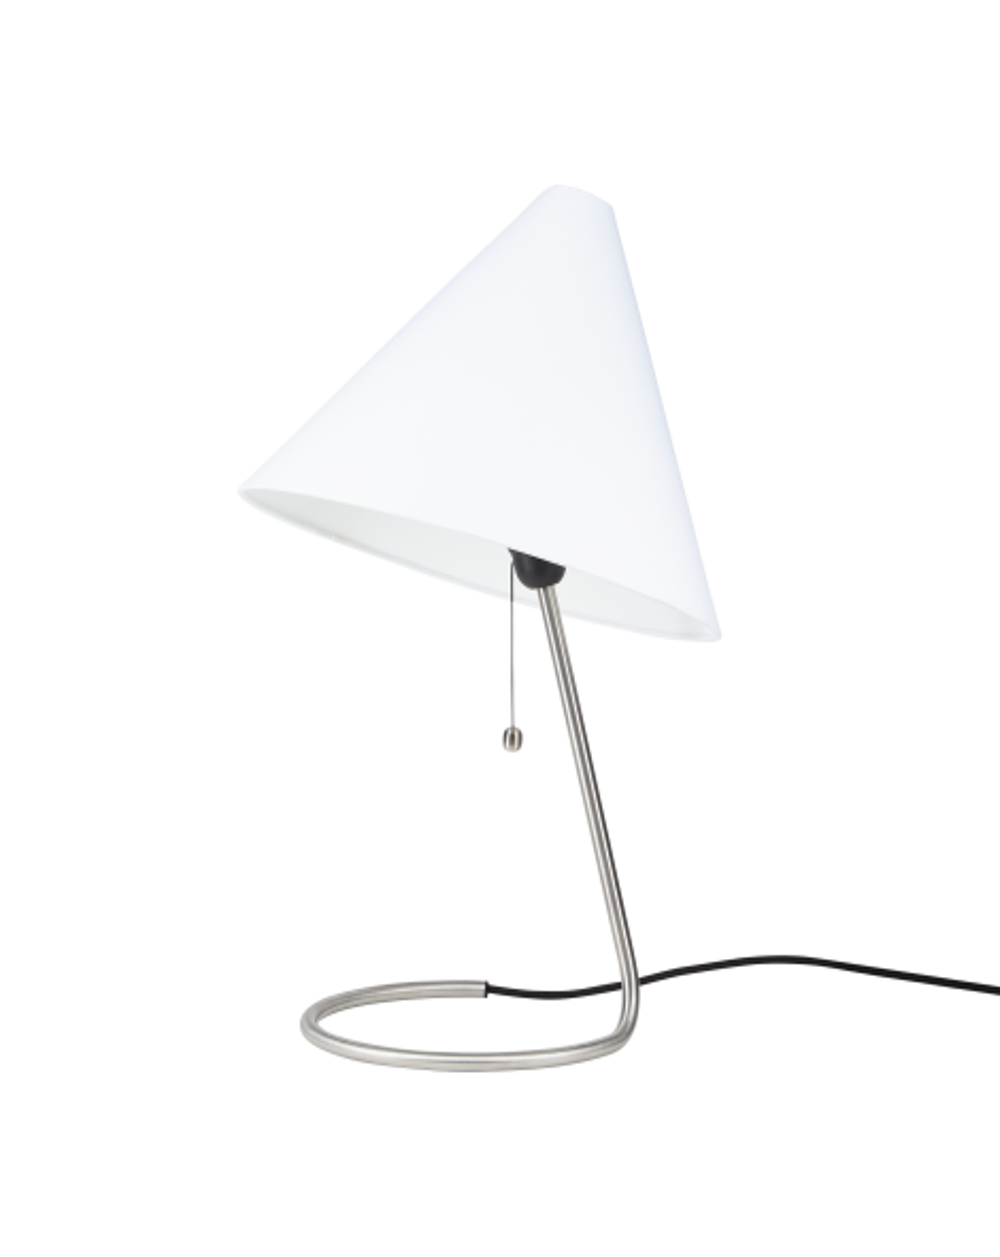 LAMPE DE TABLE FUNCO